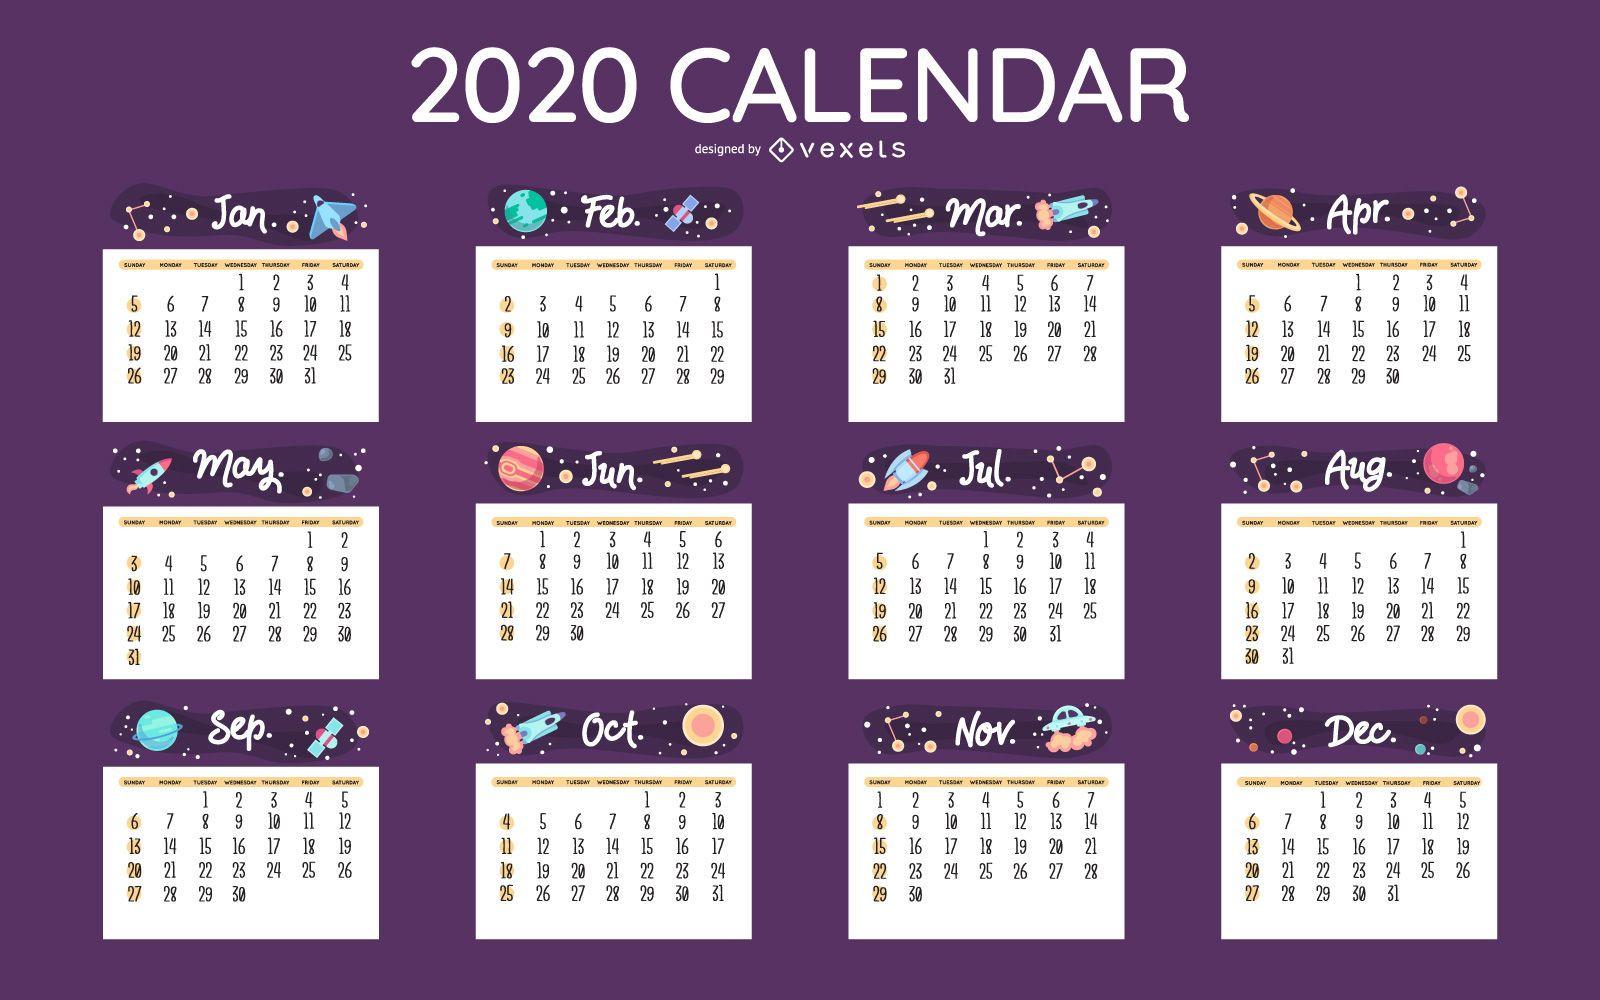 Space calendar 2020 design